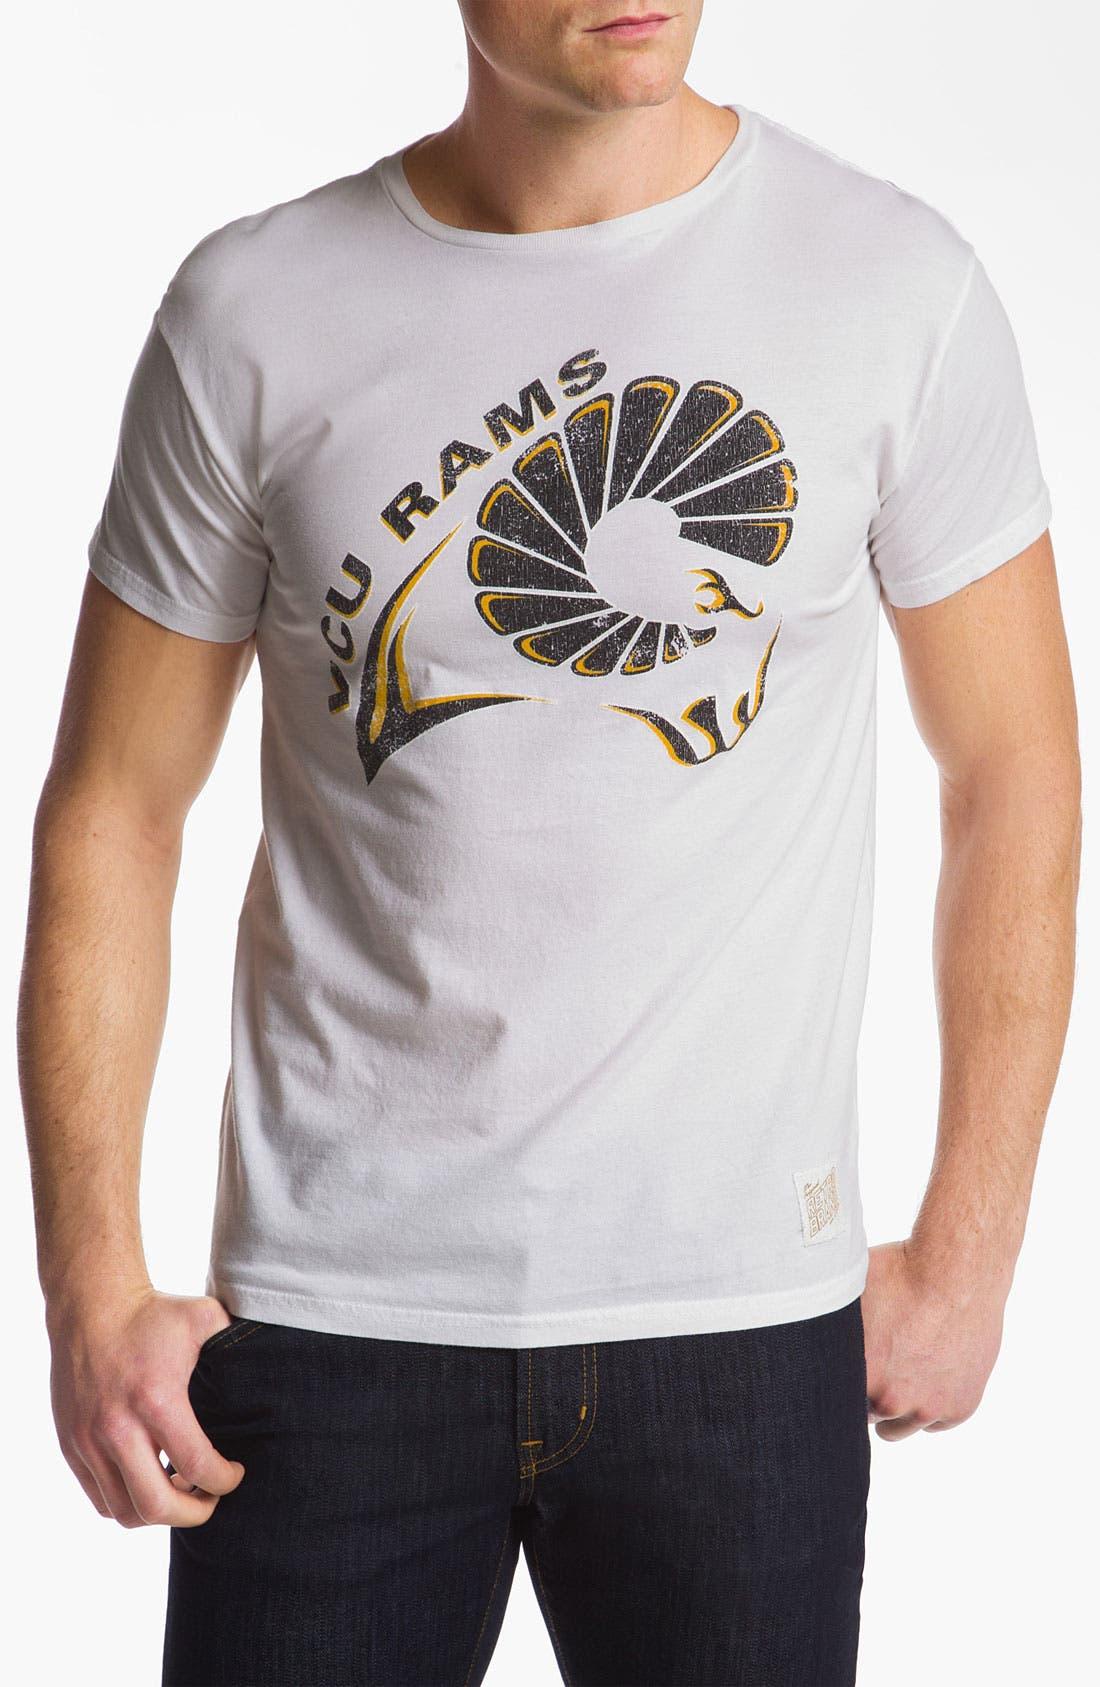 Alternate Image 1 Selected - The Original Retro Brand 'Virginia Commonwealth Rams' T-Shirt